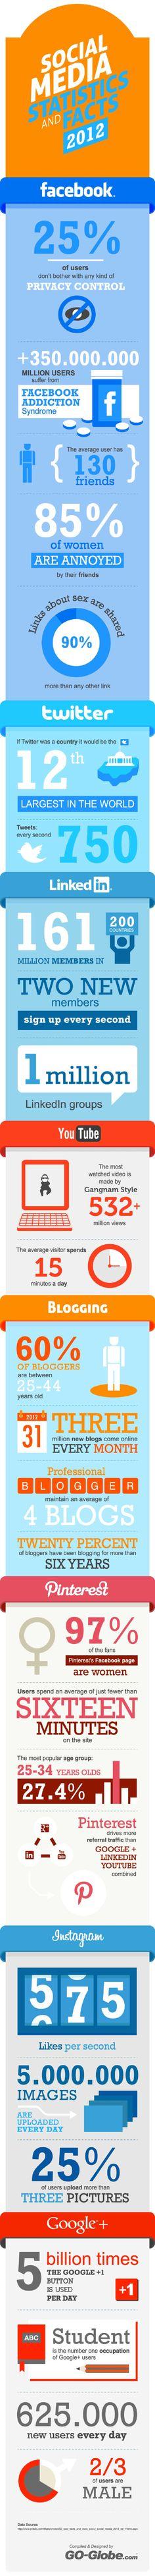 The latest social media statistics for 2012